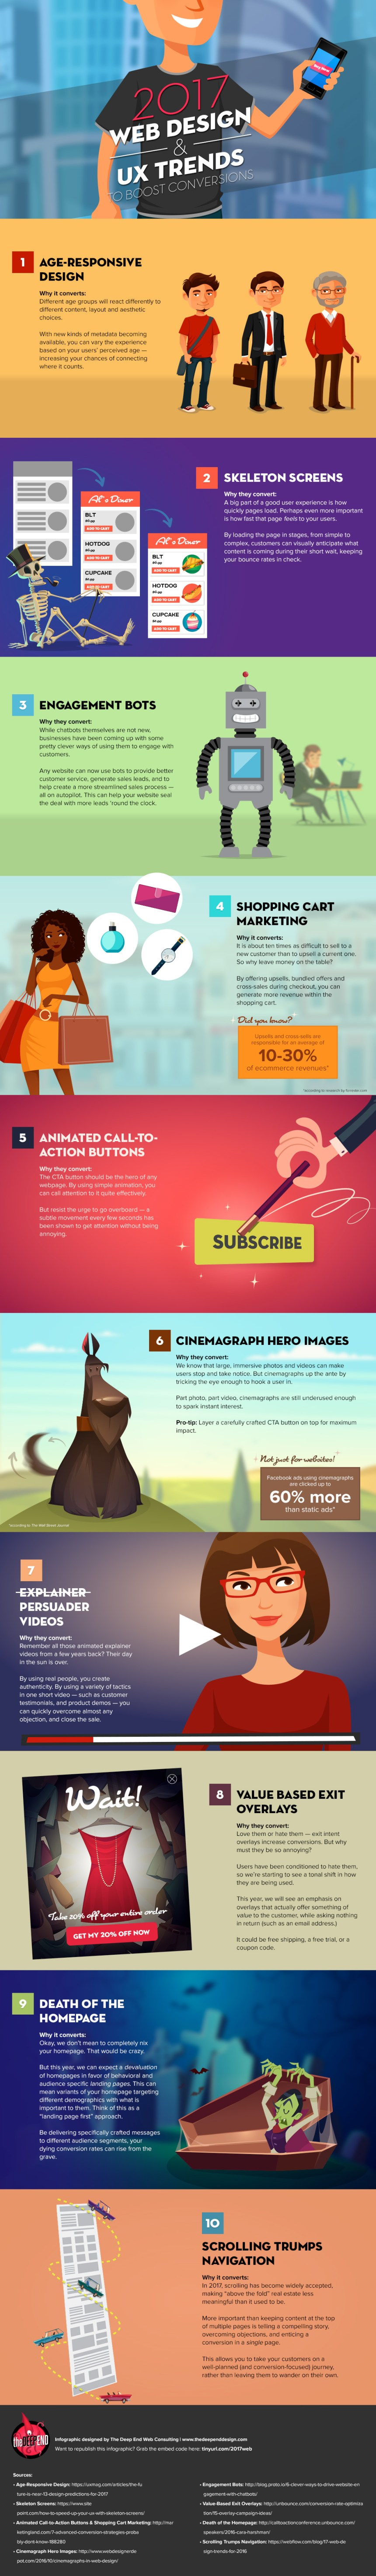 10 poderosas tendencias en diseño web